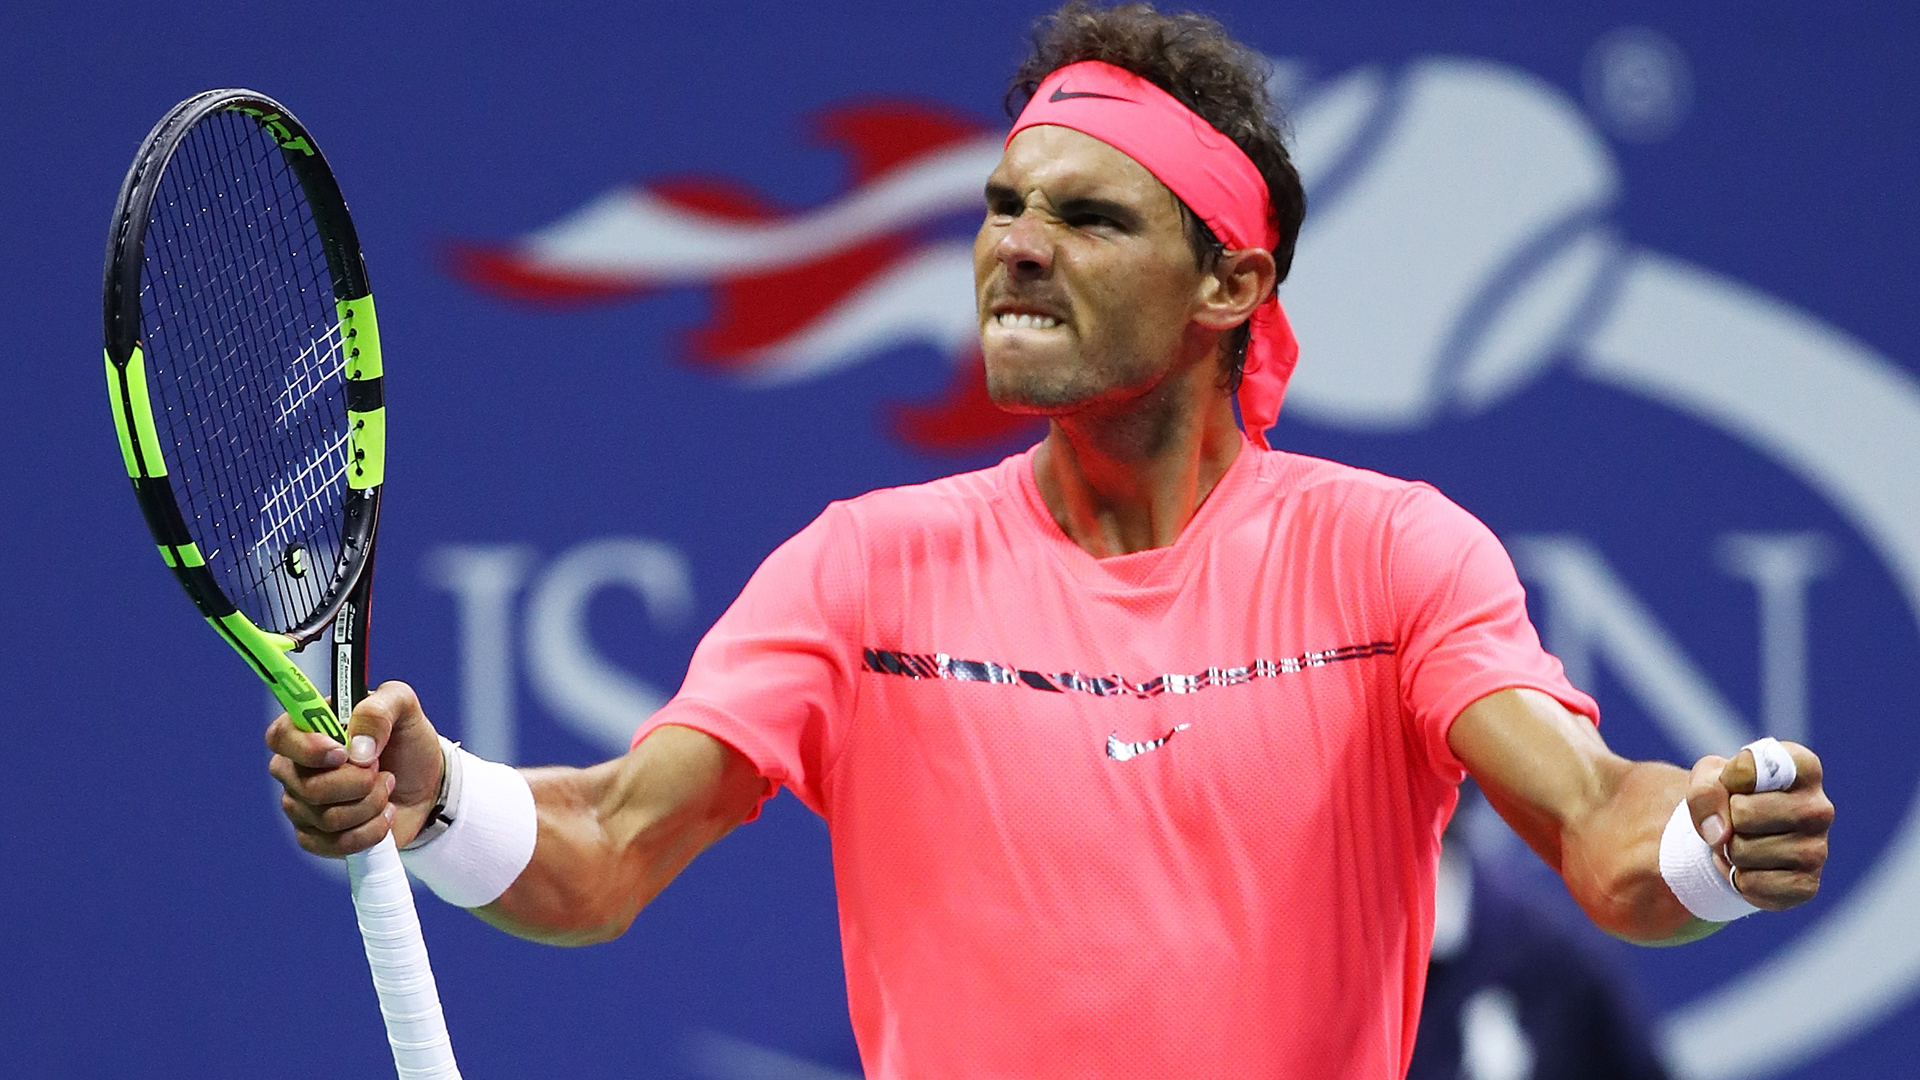 Wasteful Rafael Nadal overcomes Mayer to reach last 16